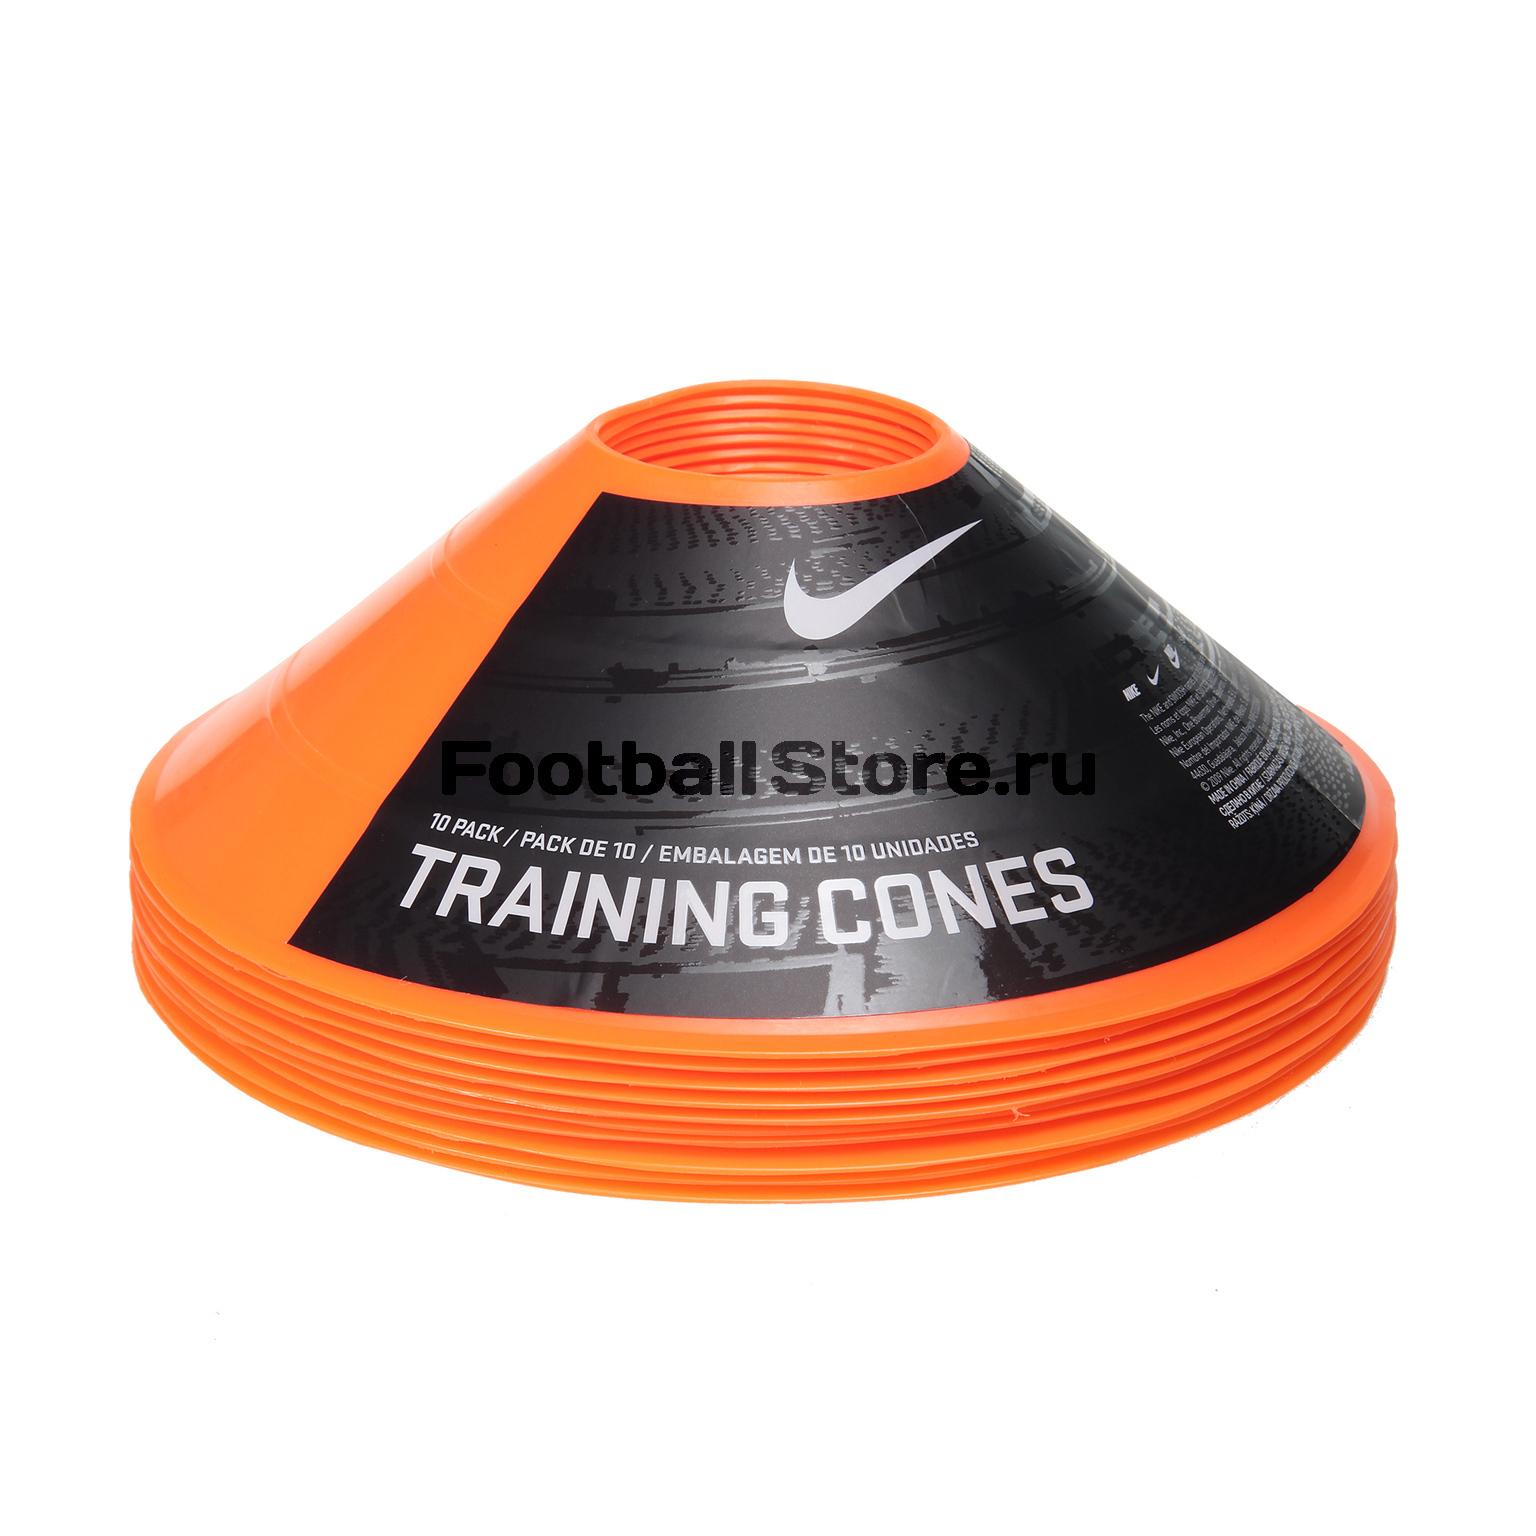 Конусы тренировочные Nike 10 Pack Orange N.SR.08.888.NS